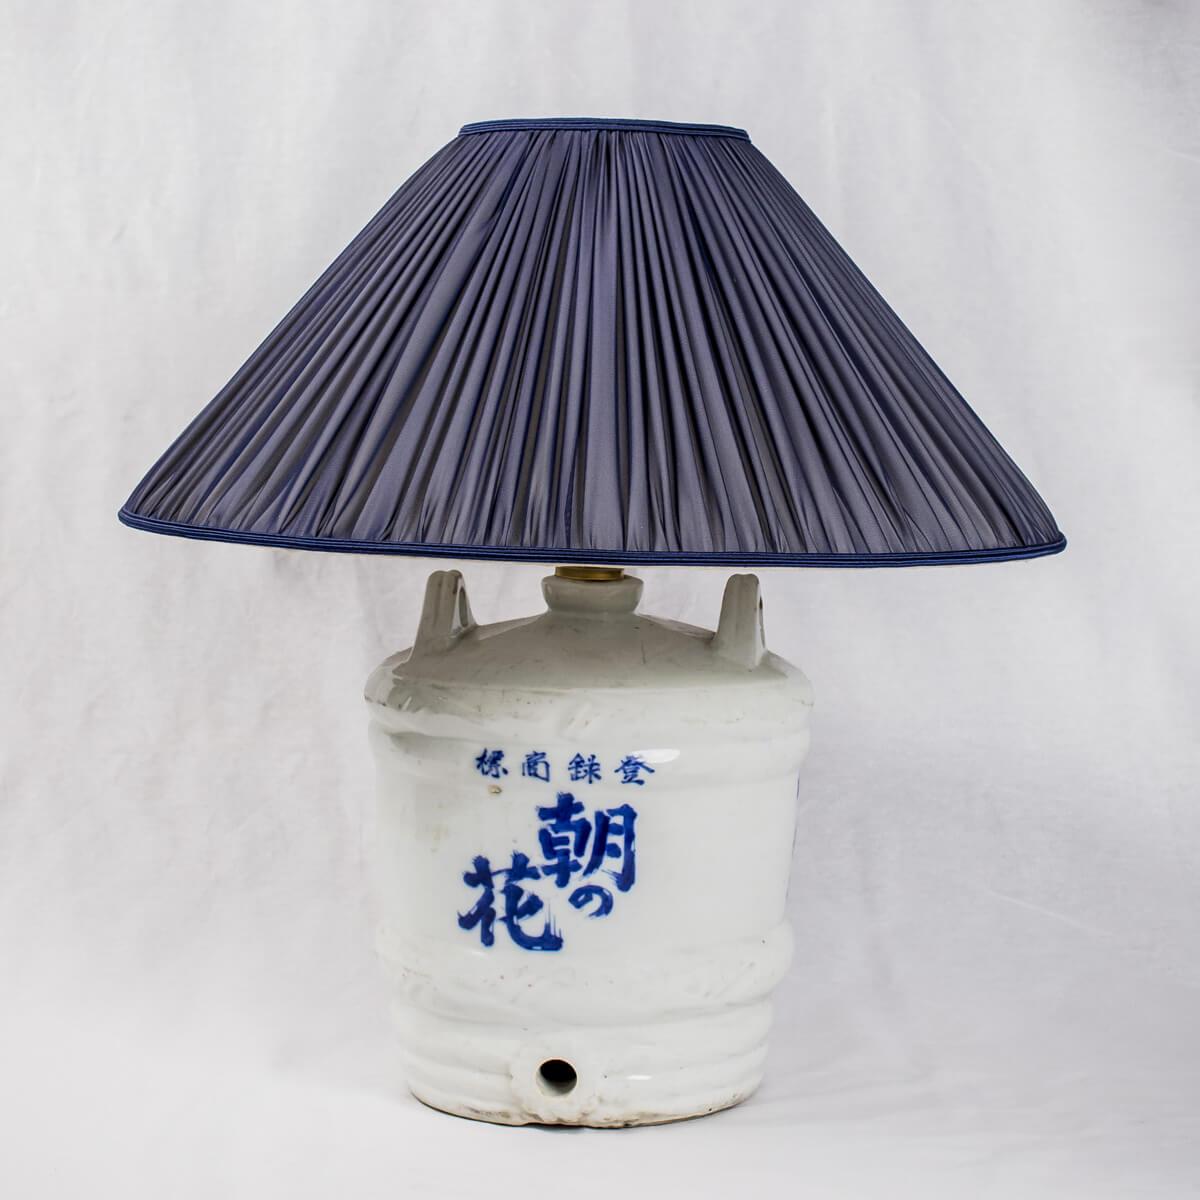 Bottle sakè giapponese con lumi